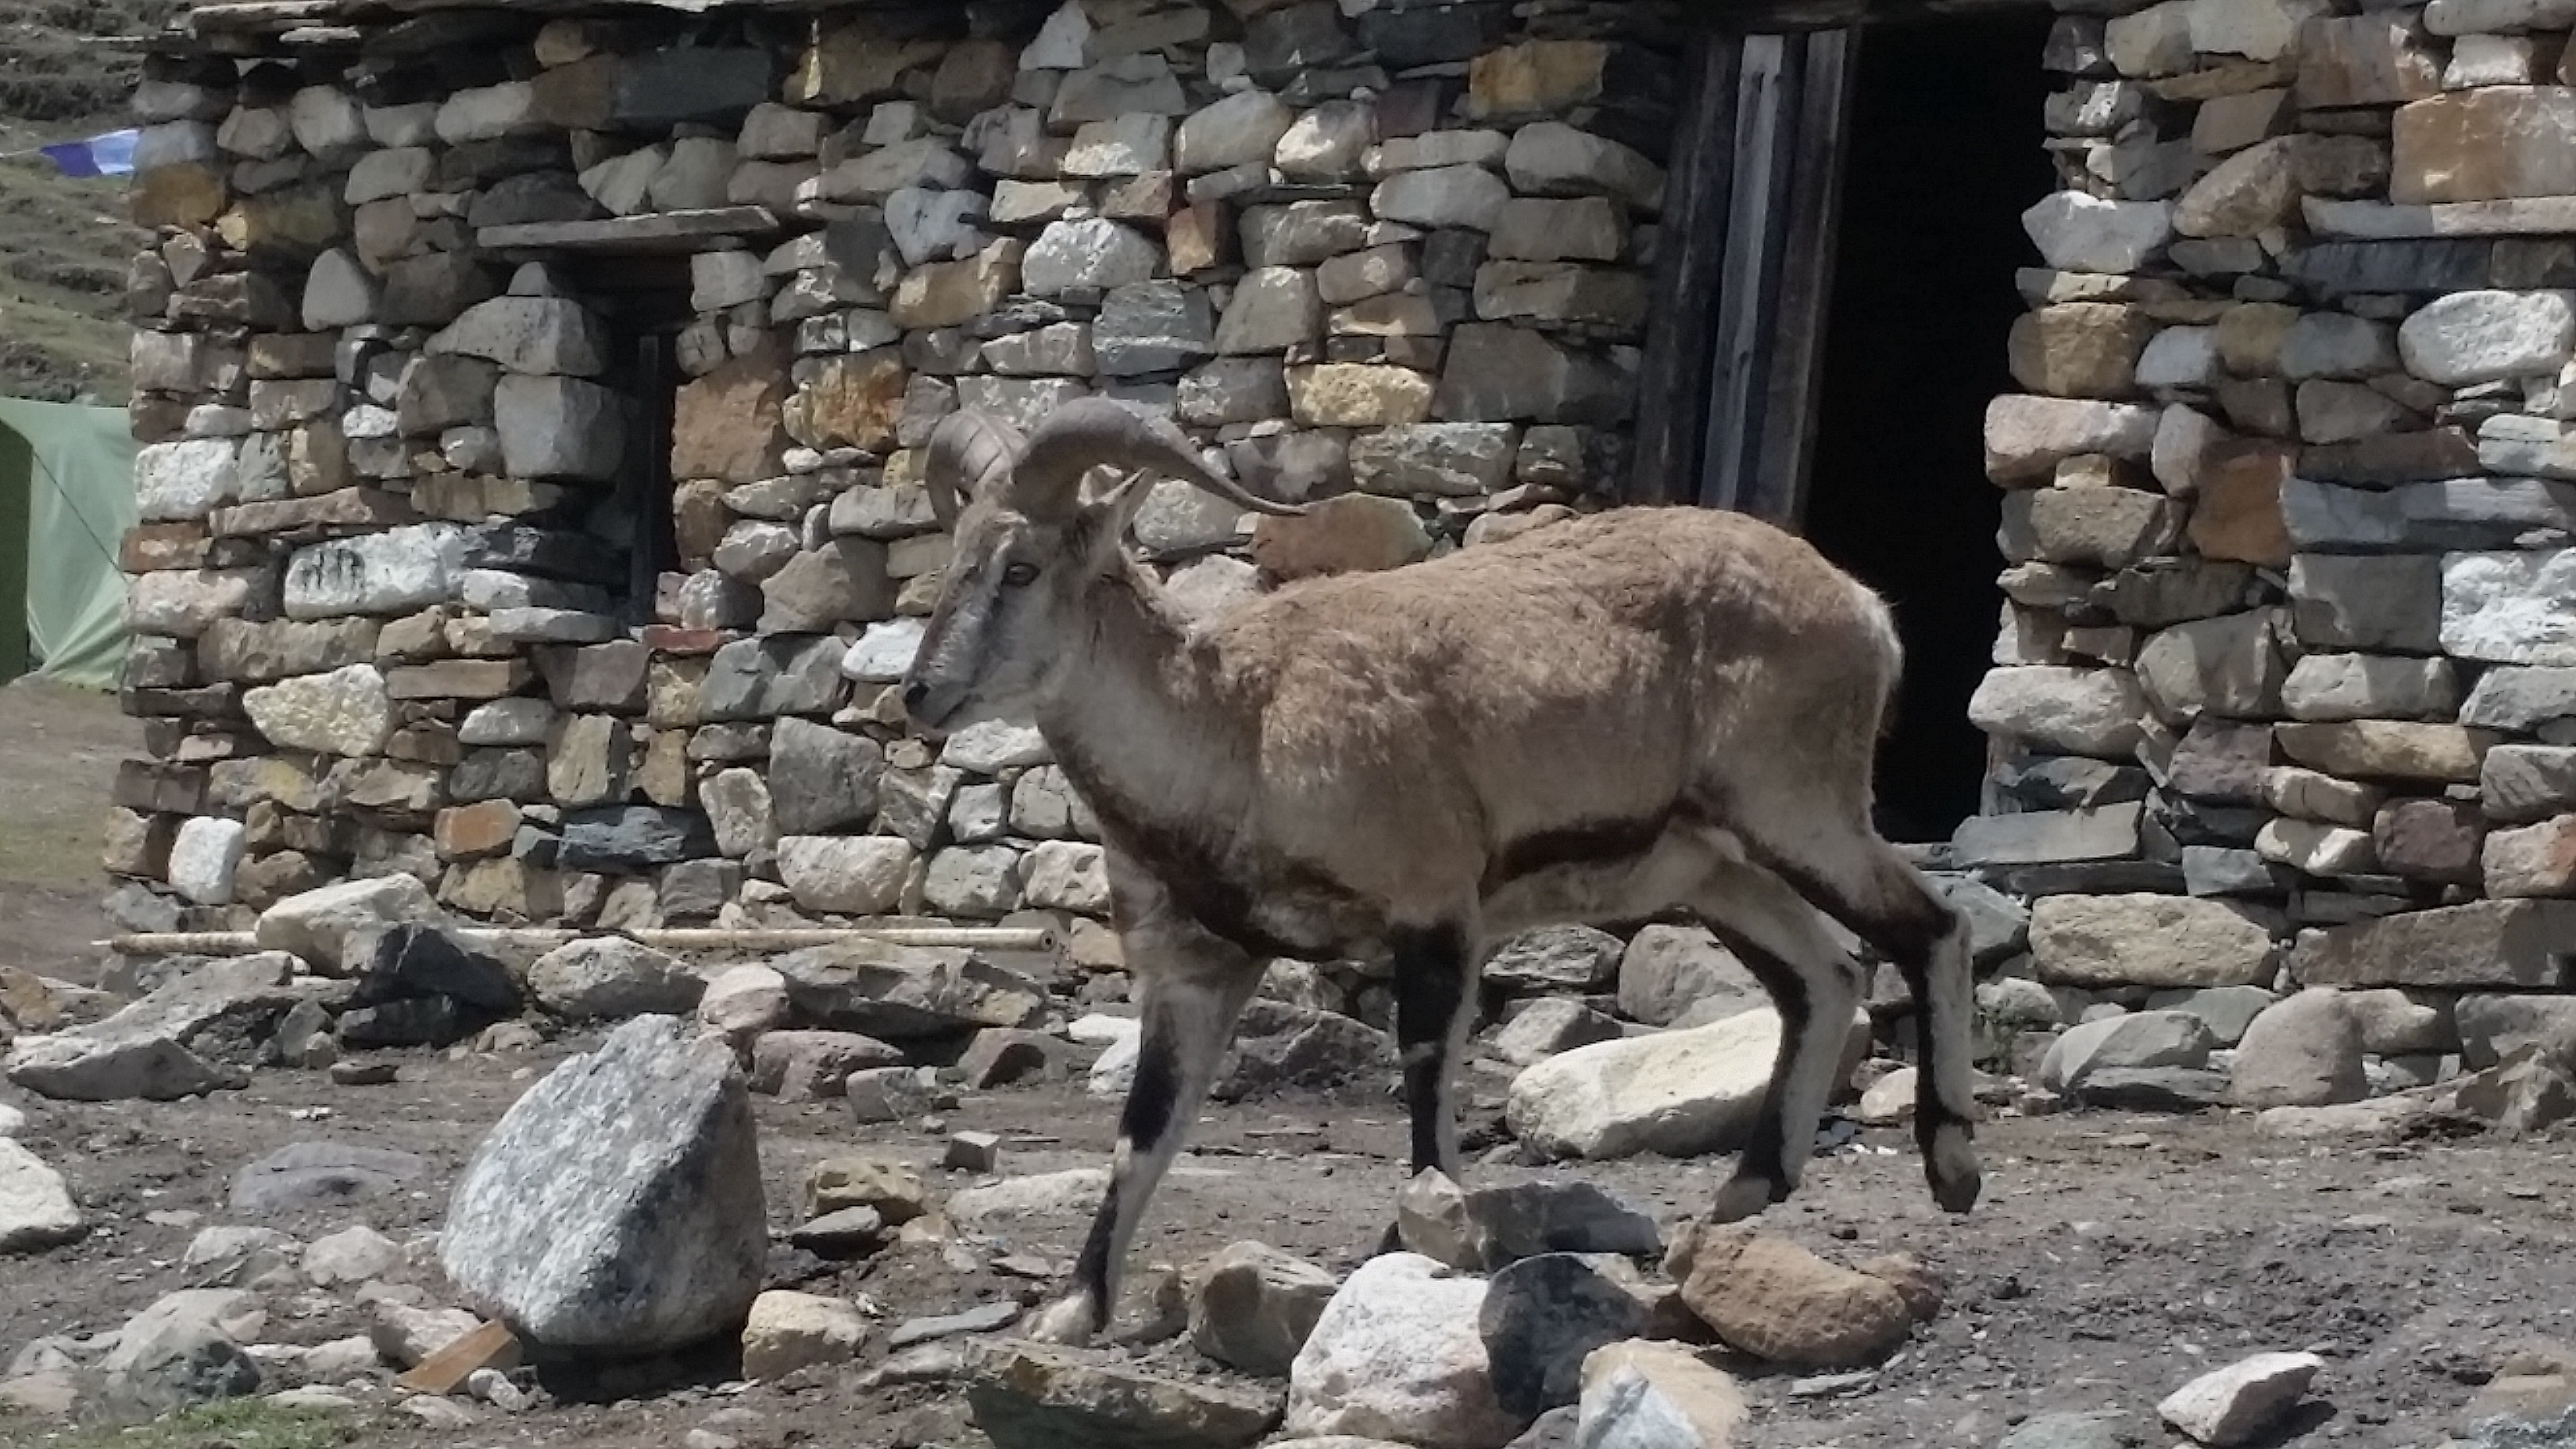 Sheep in Manaslu